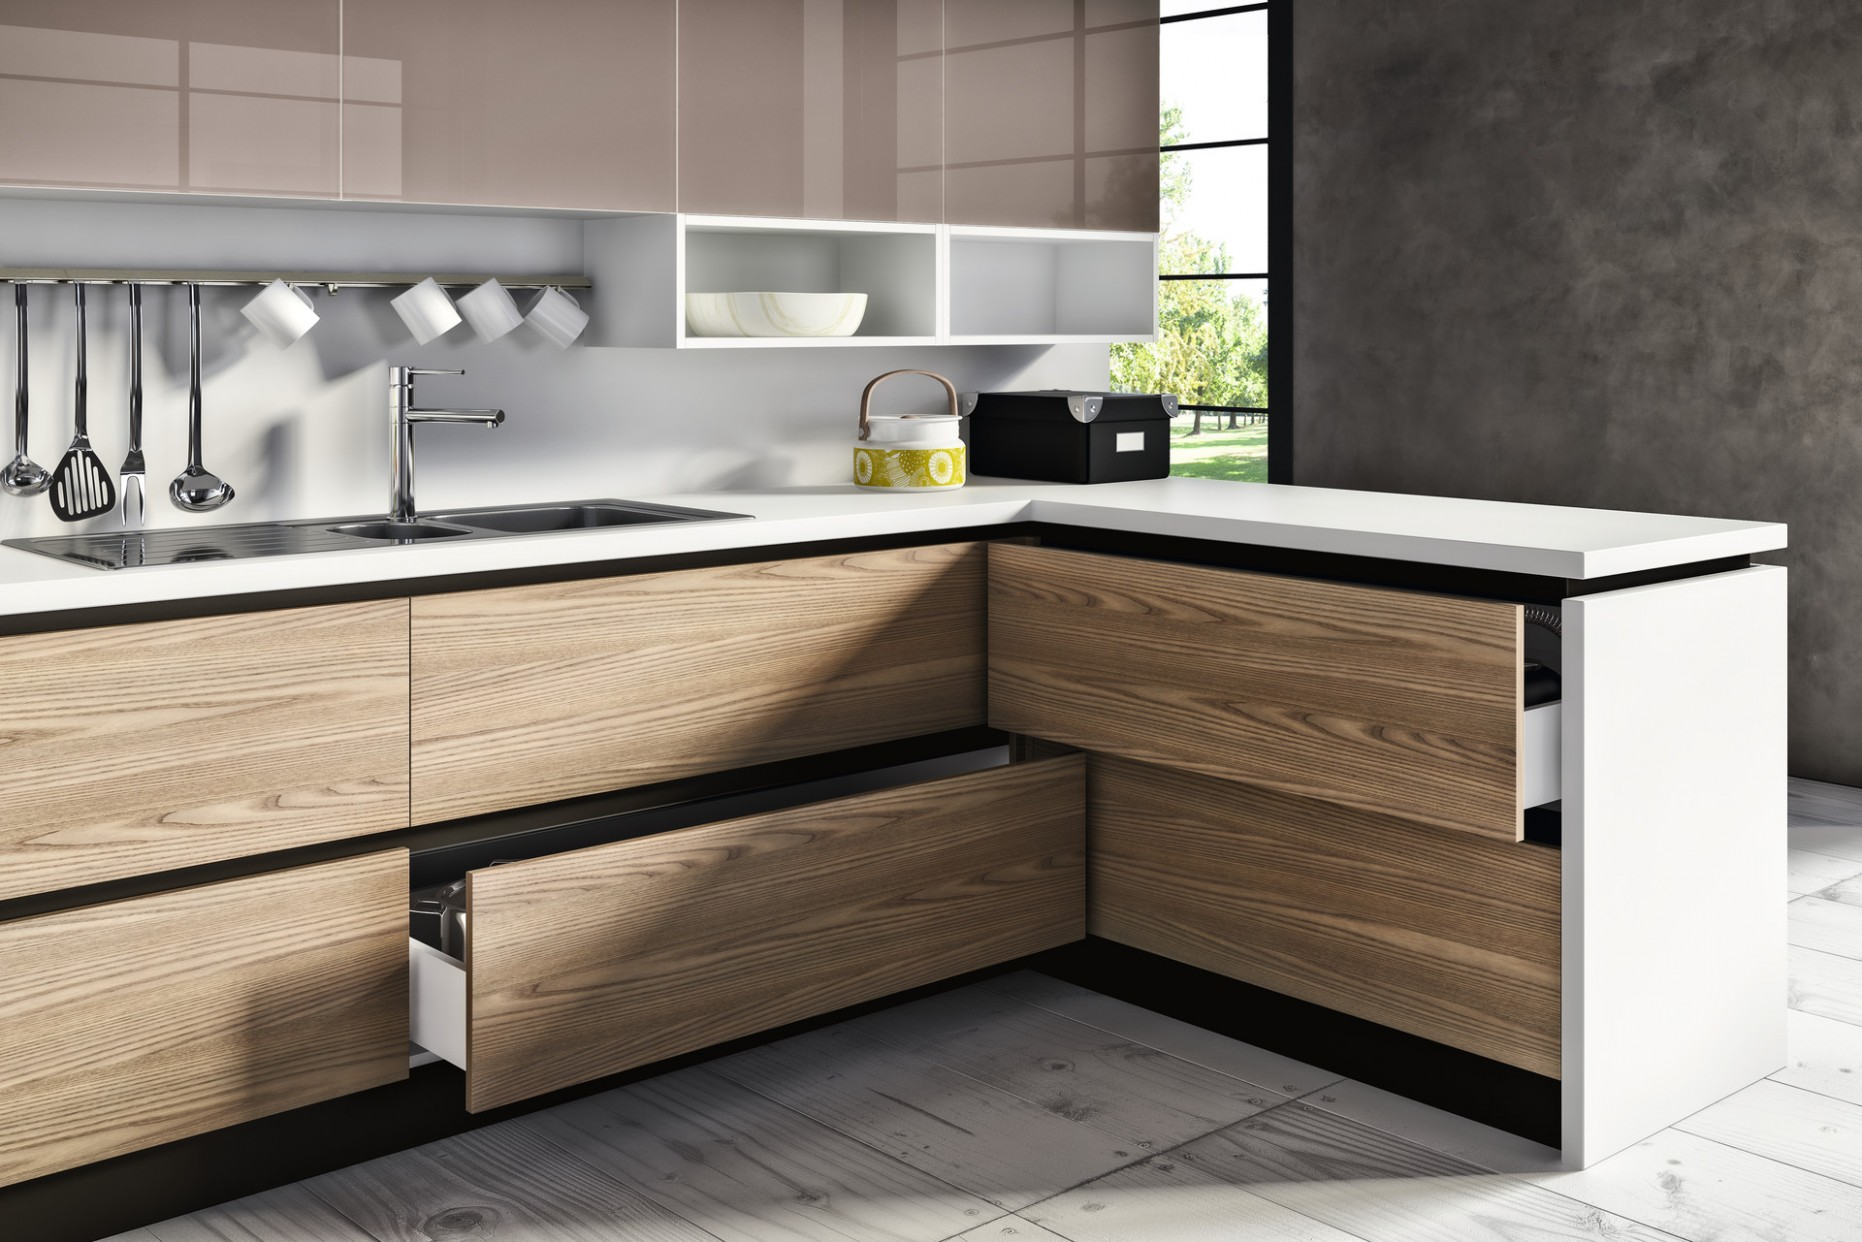 Eureka LAGUNA  Gola Profile  Kitchen Cabinets and Drawers - Integrated Kitchen Cabinets